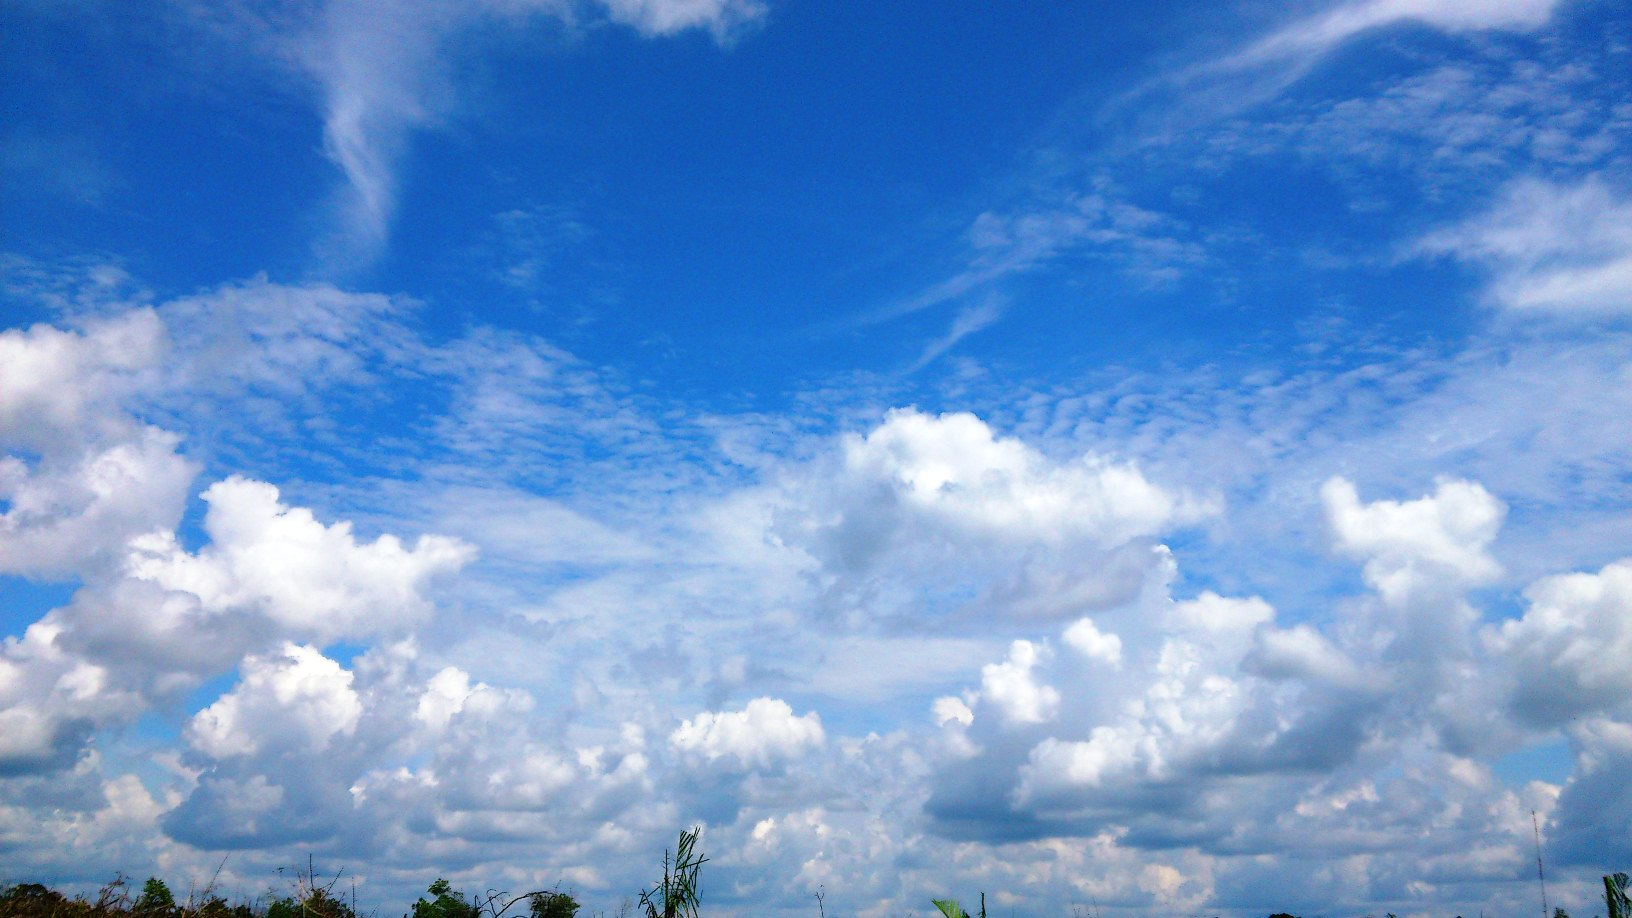 File:Mendung di langit biru (50).JPG - Wikimedia Commons